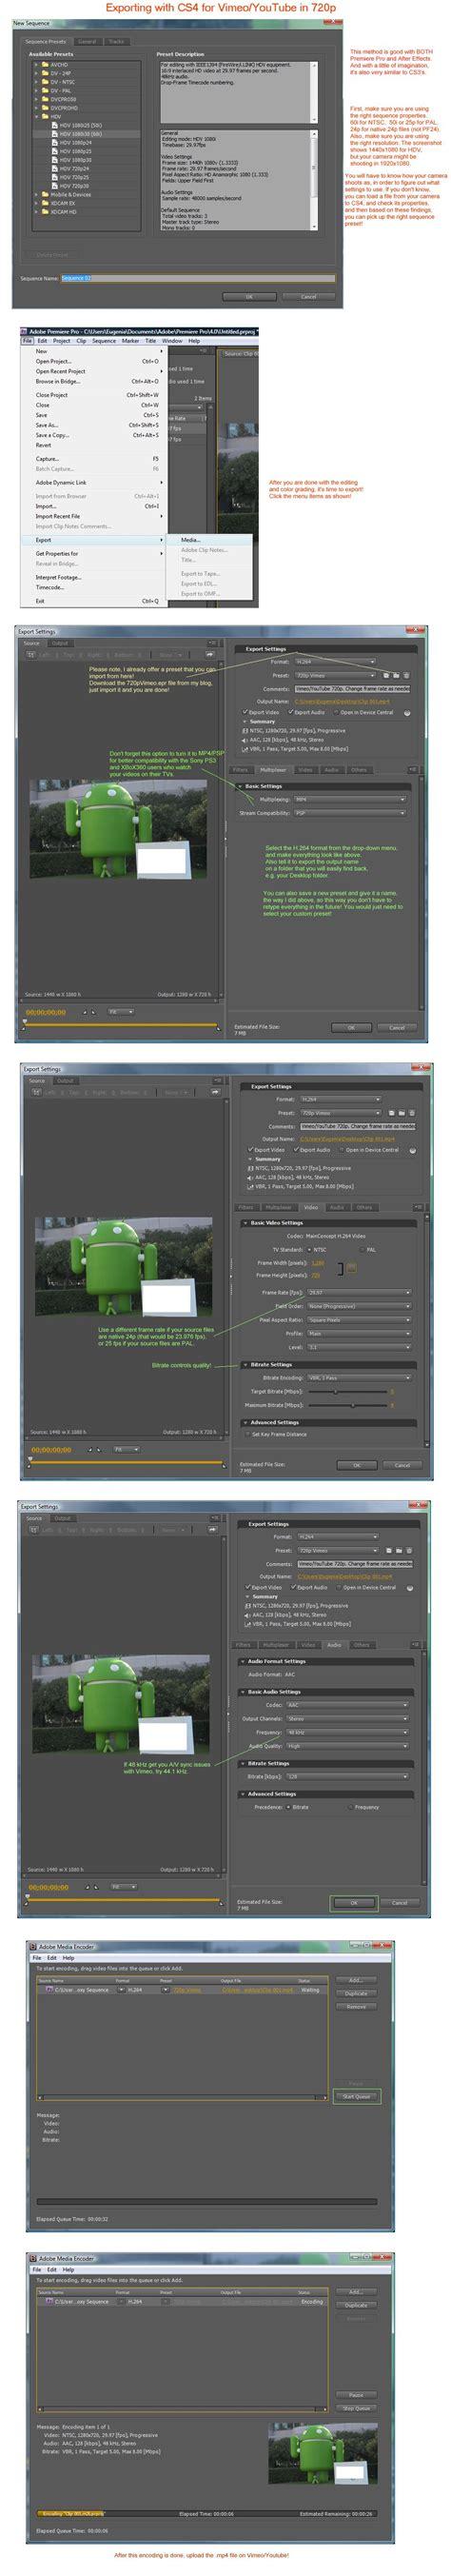 export adobe premiere pro cs4 best compression settings for adobe premiere pro cs4 on vimeo